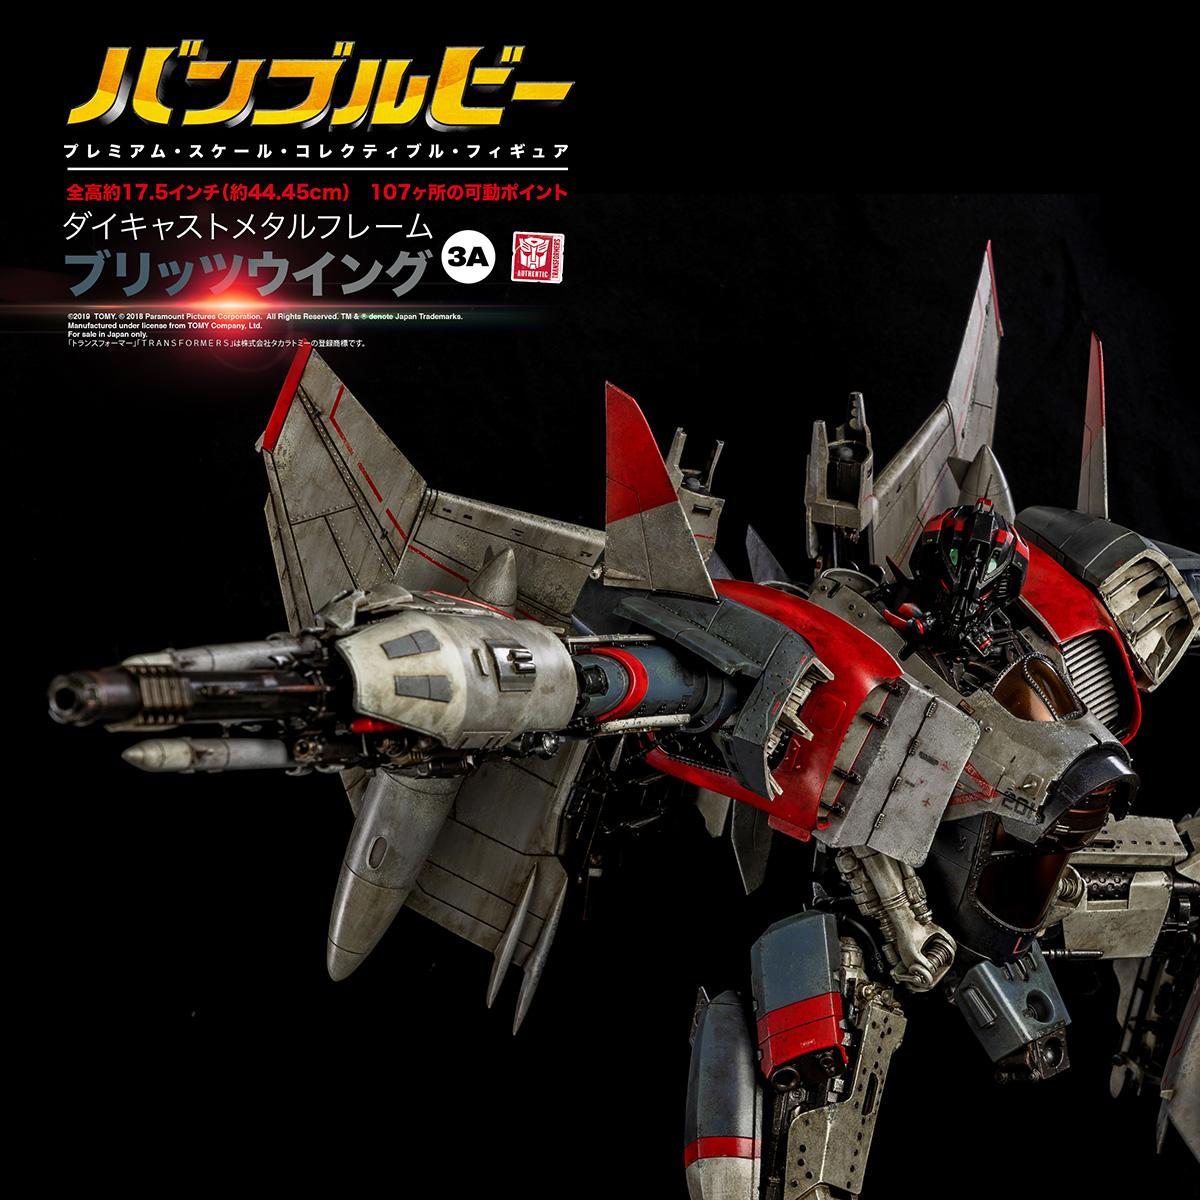 Blitzwing_PM_JAP_1146.jpg